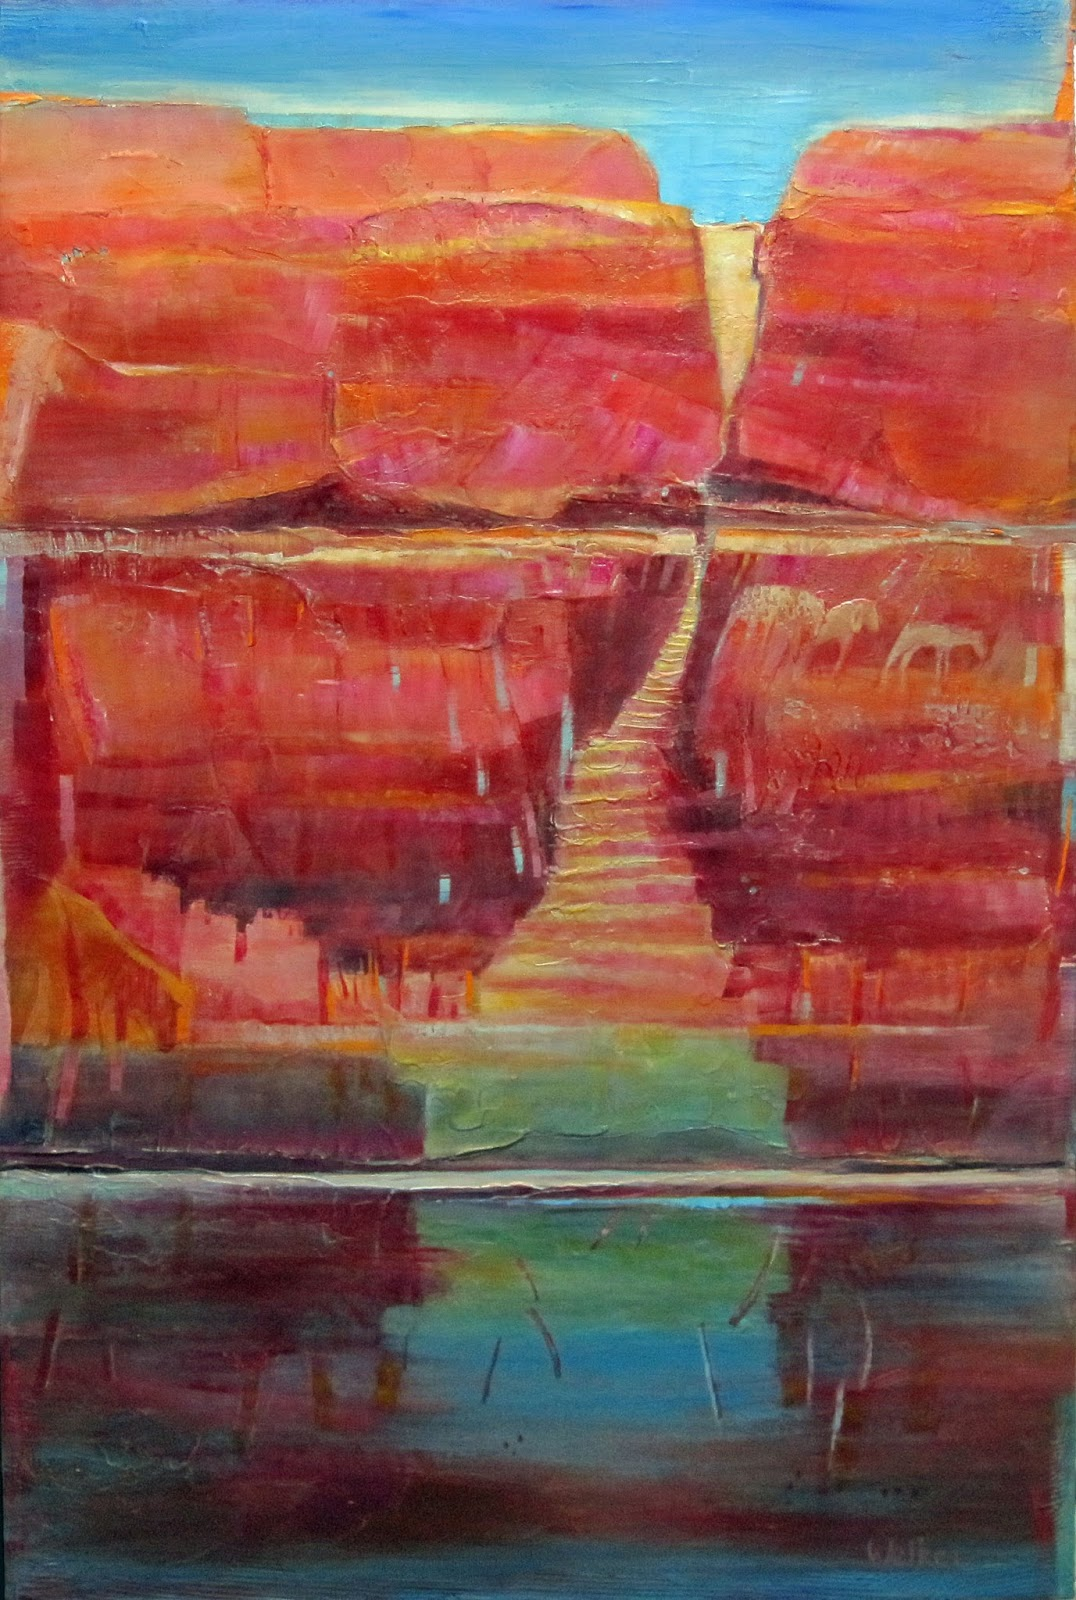 Lynn Welker Contemporary Art: On Their Way to Sedona